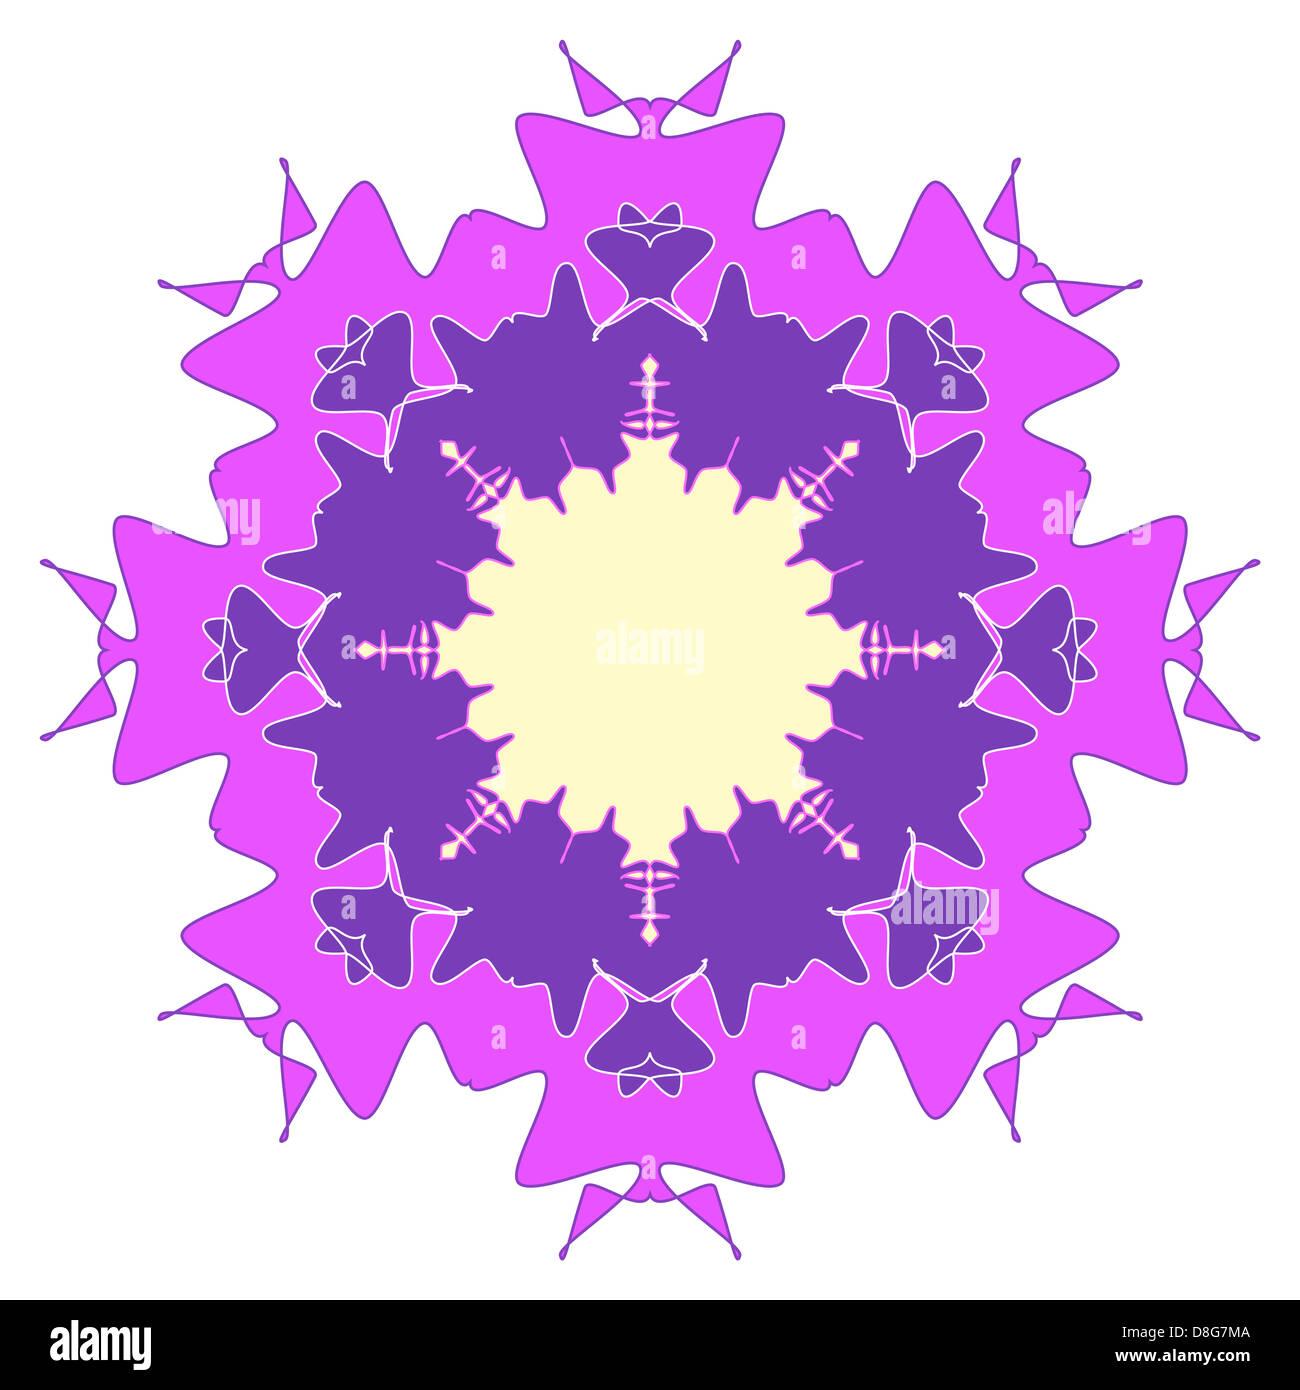 Artistic purple floral design Stock Photo